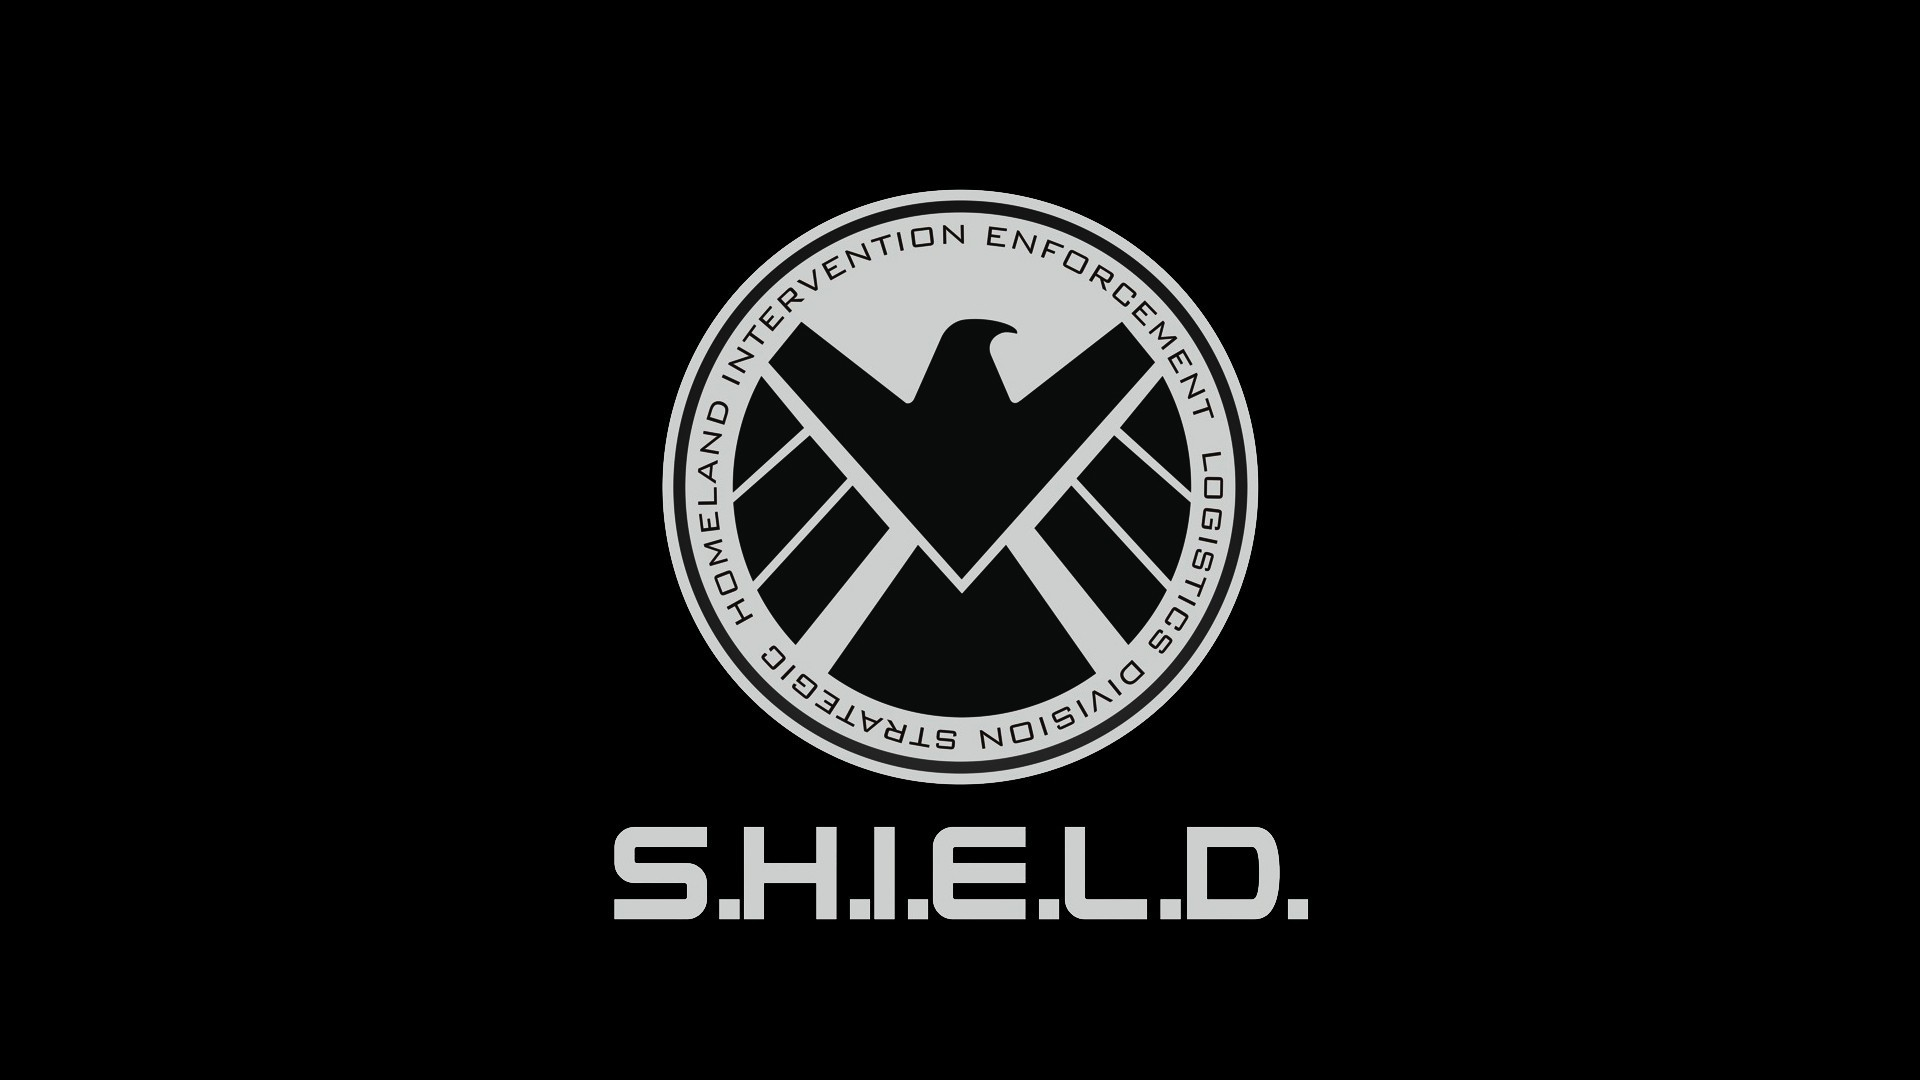 Shield Wallpaper Download Free Stunning High Resolution